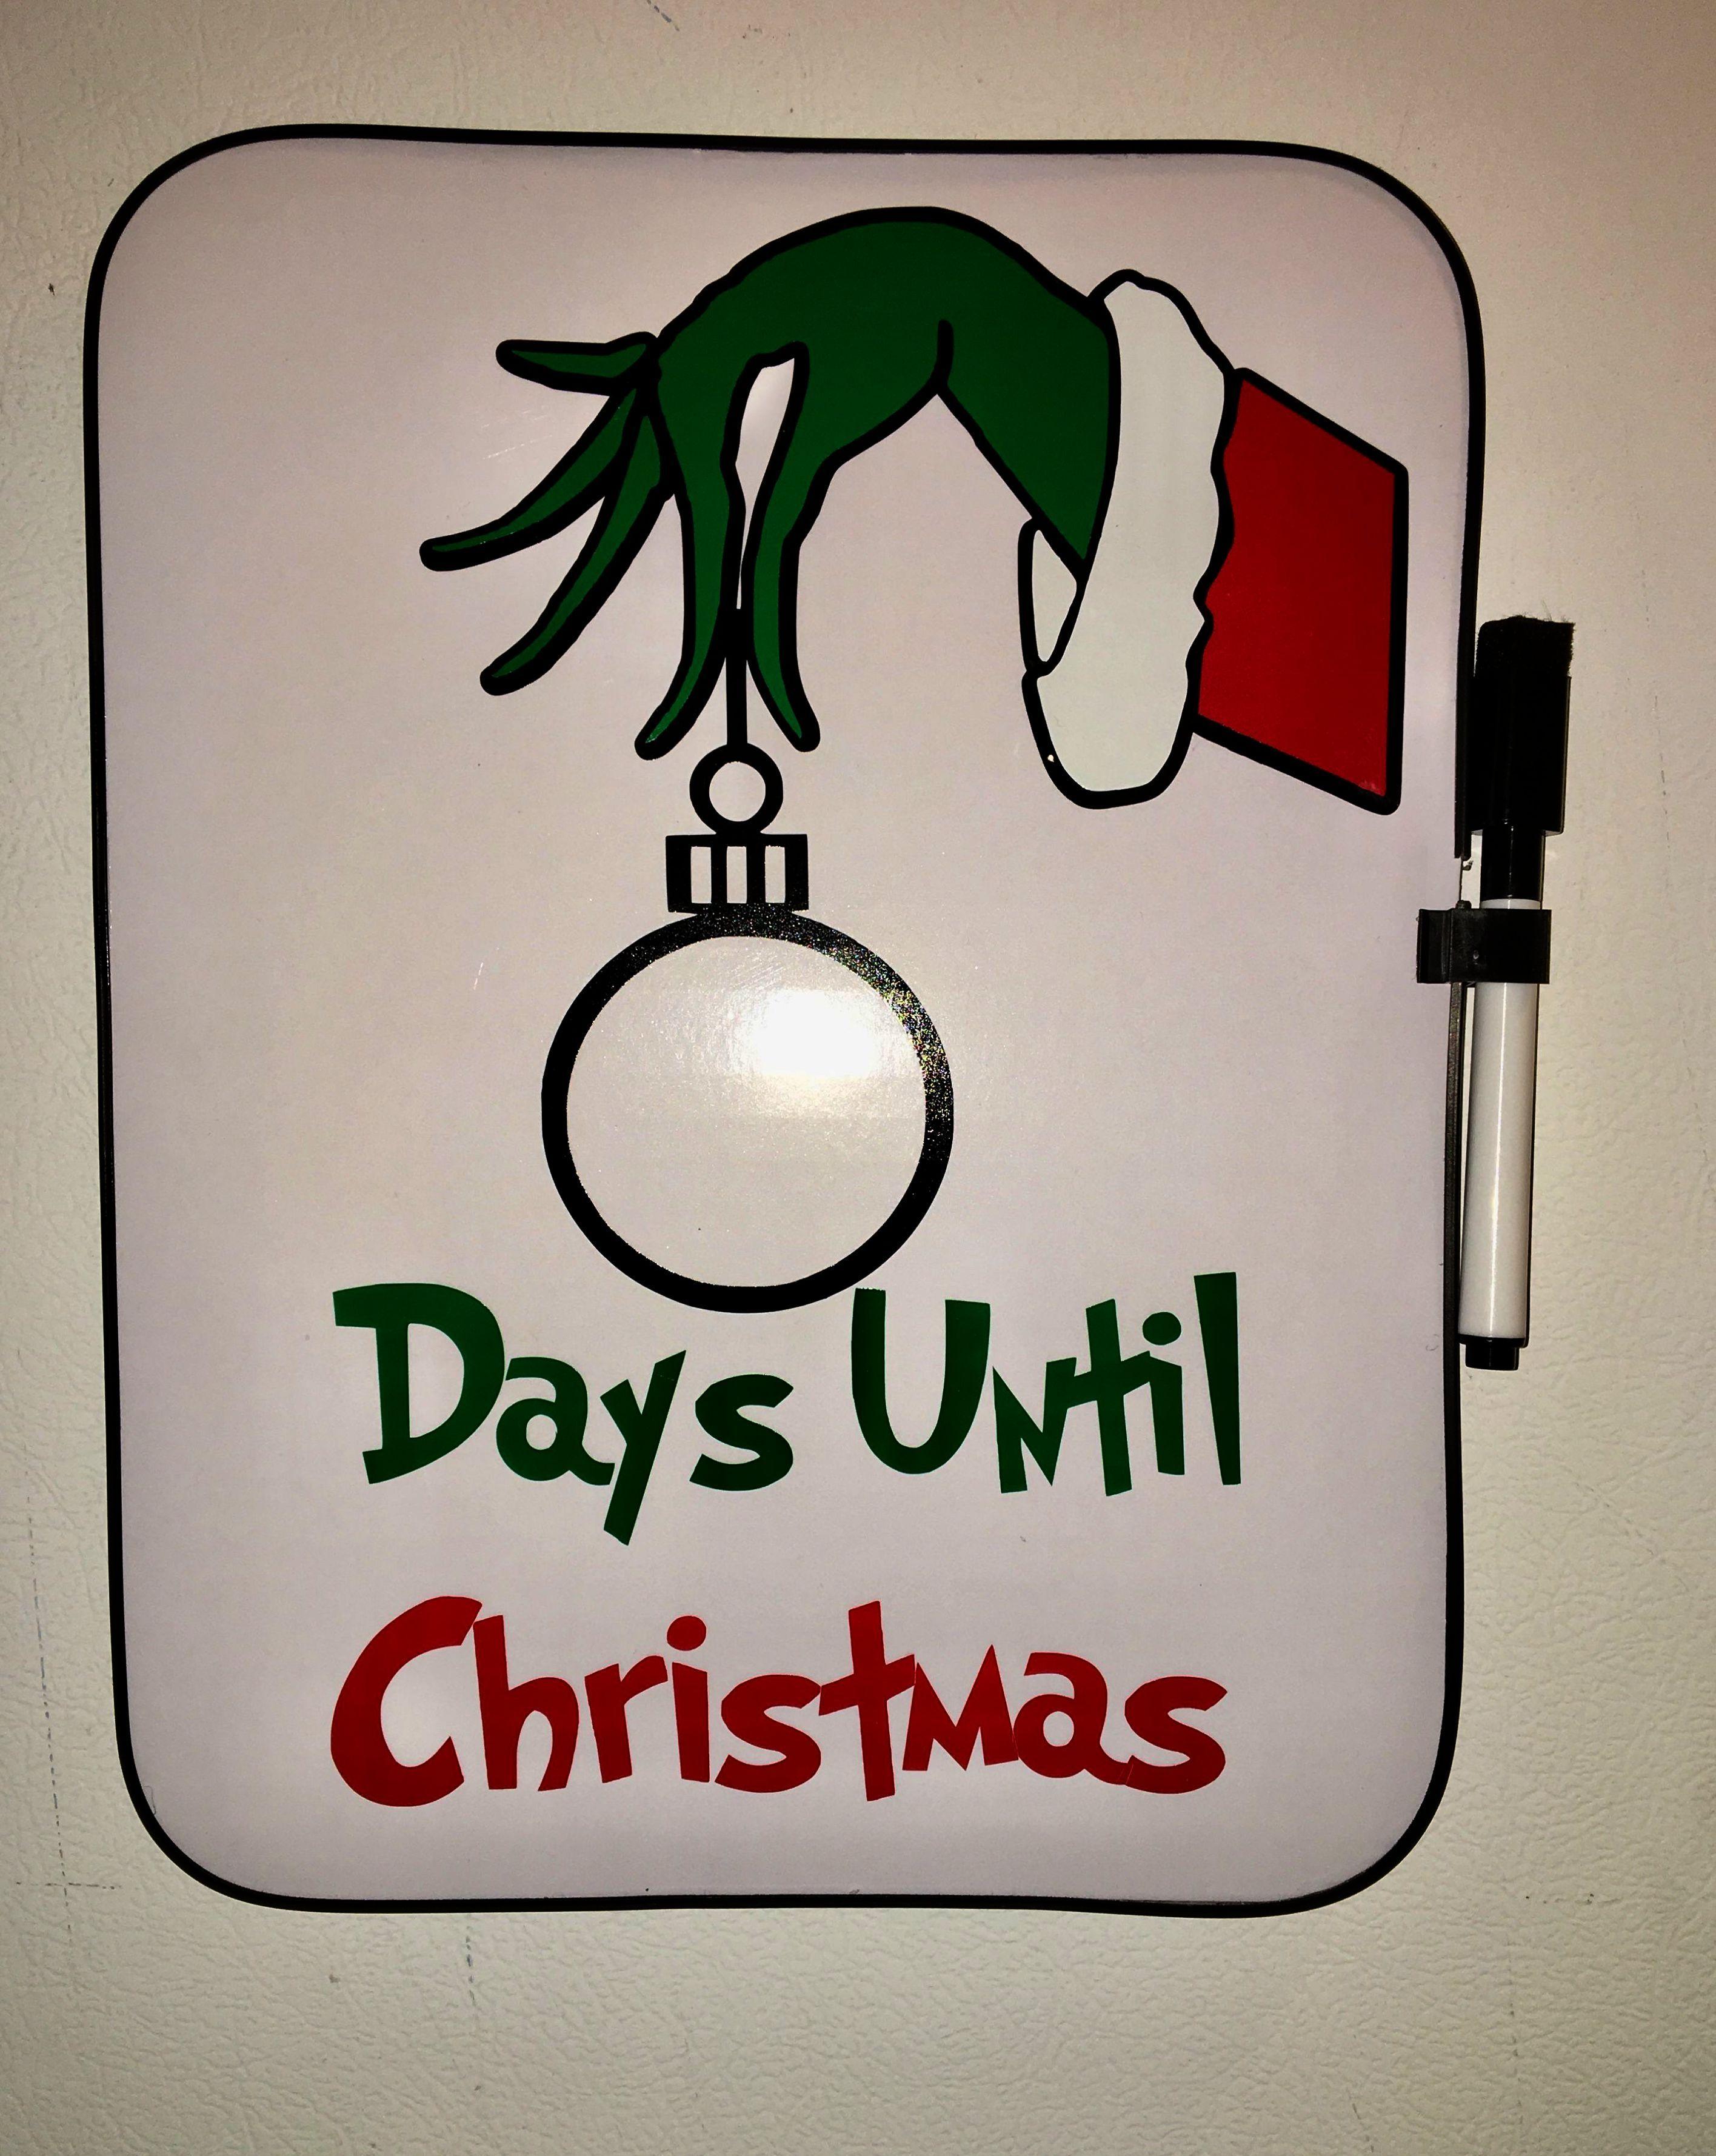 Christmas Tree Keeper Not Christmas Home Decor Trends 2017 An Christmas Movies James Franco Even Grinch Christmas Whoville Christmas Merry Christmas Decoration